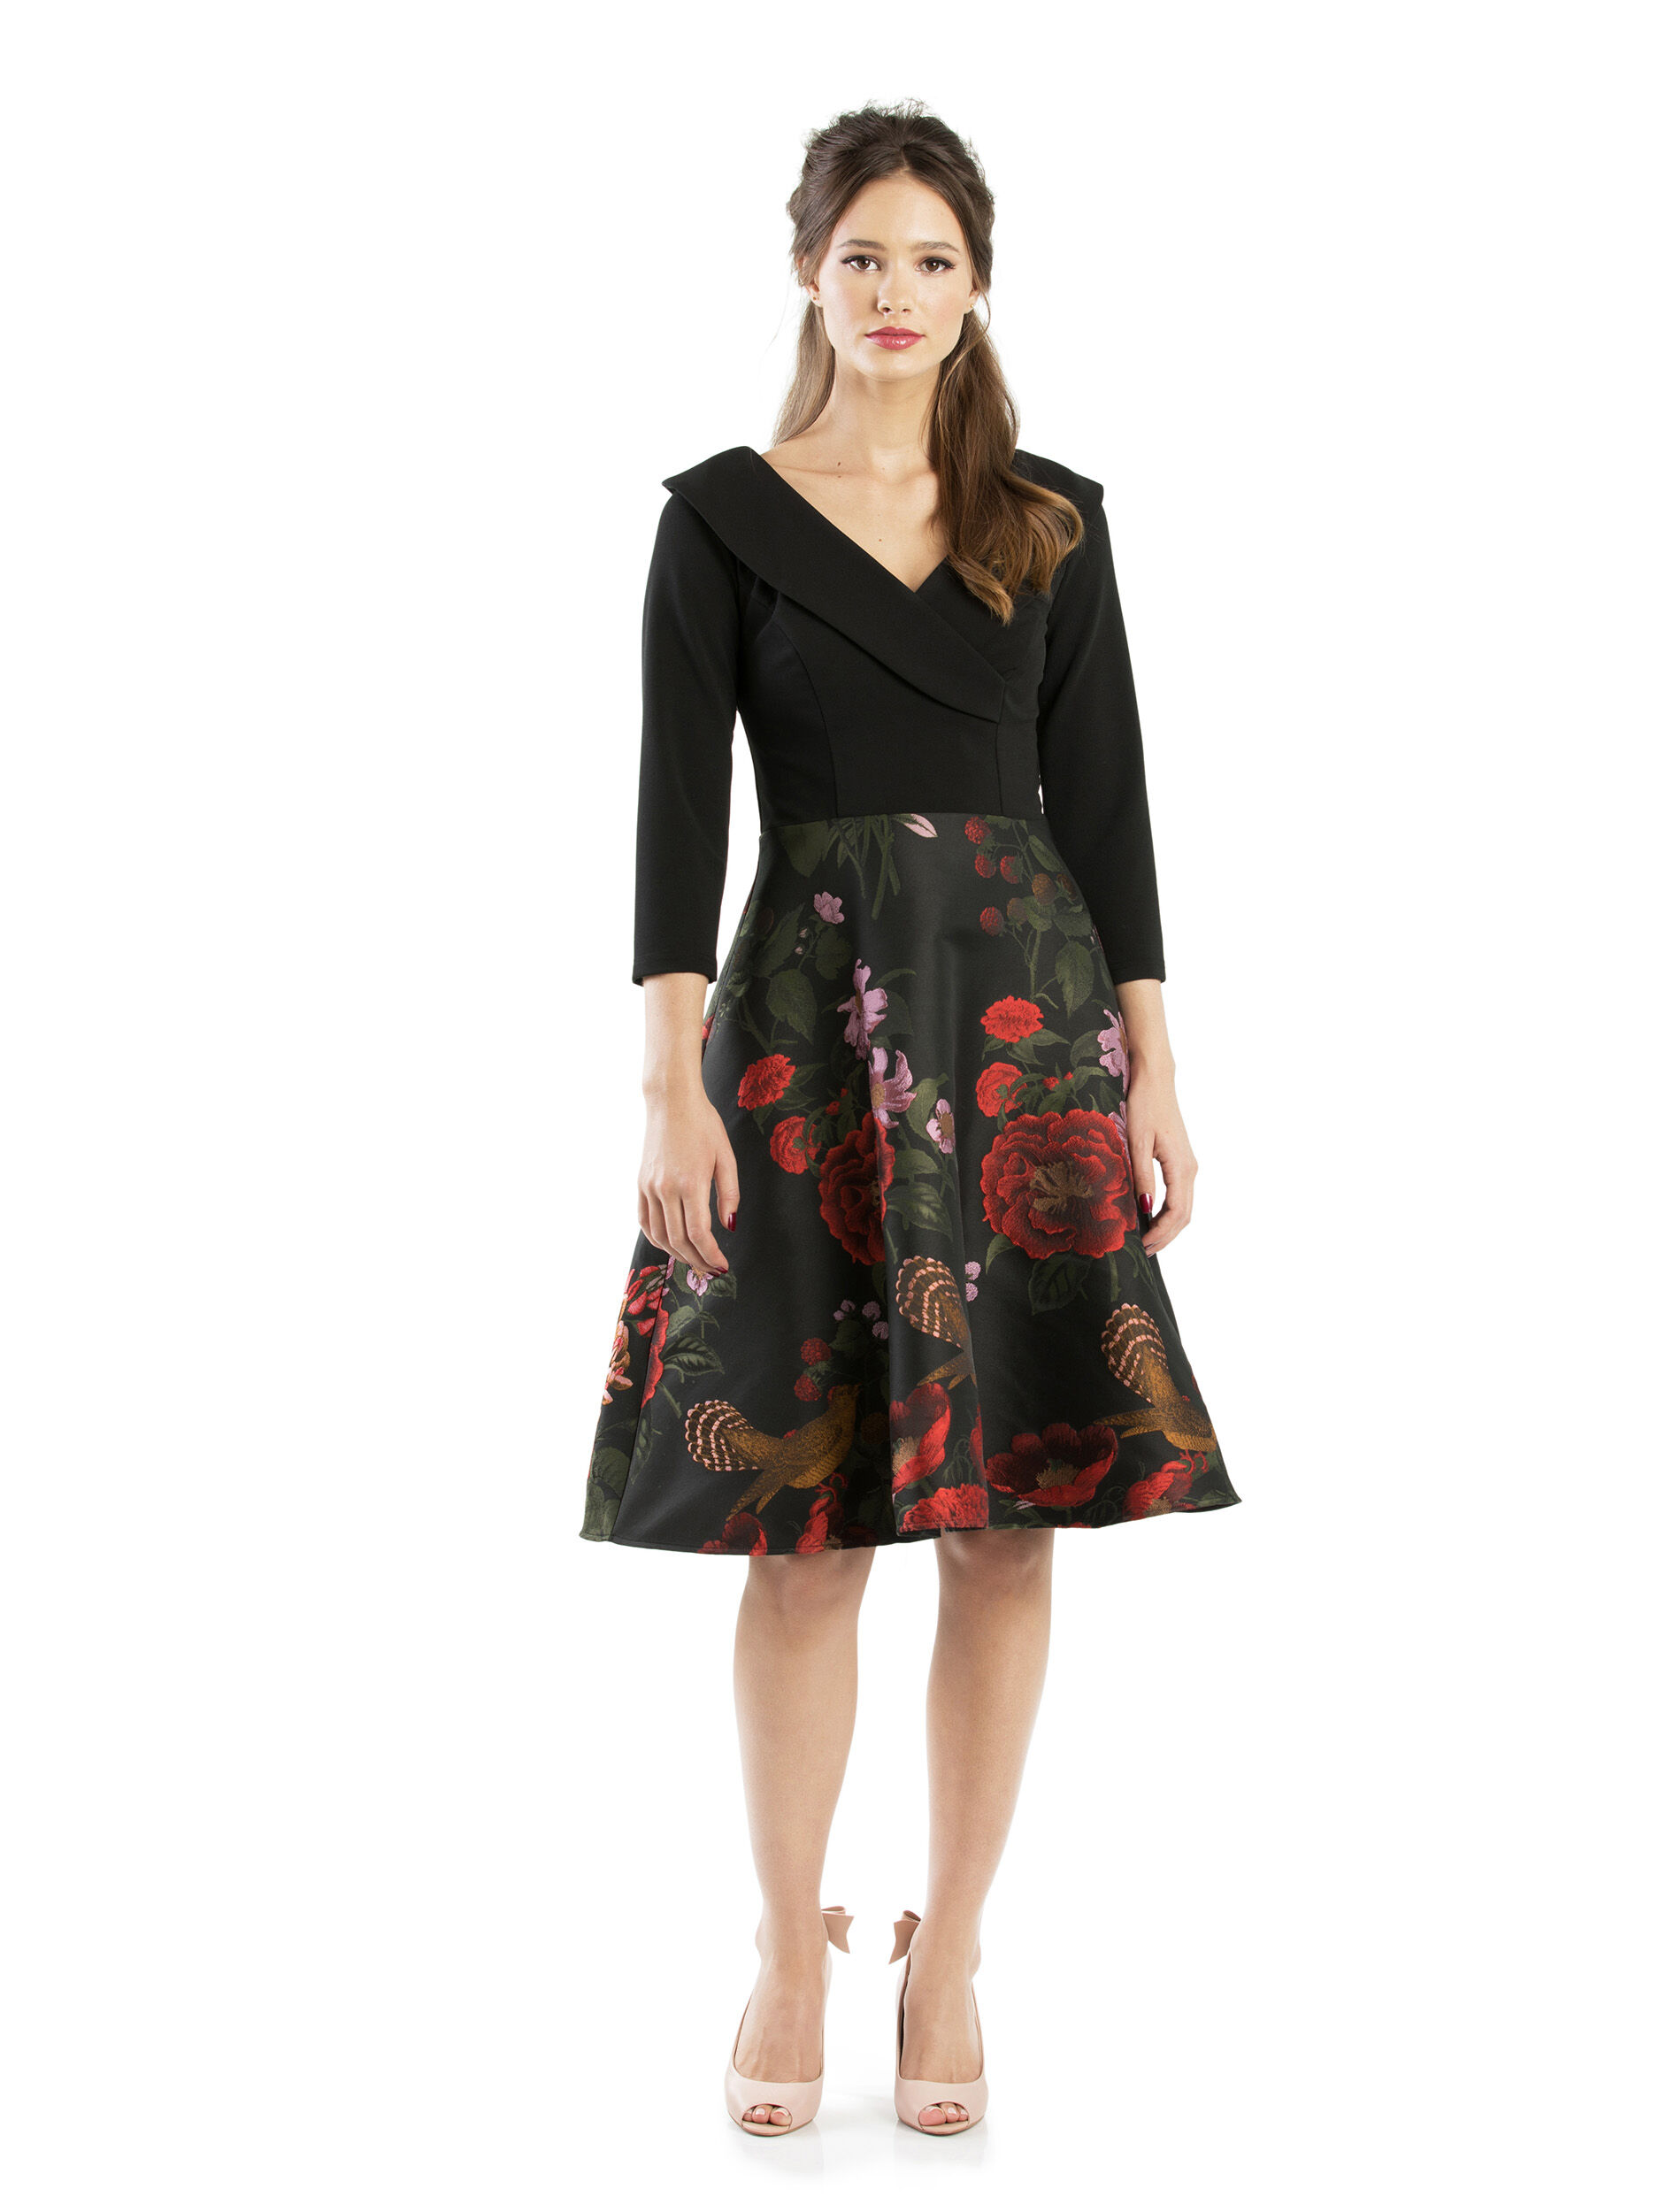 Formal Dresses for Over 50